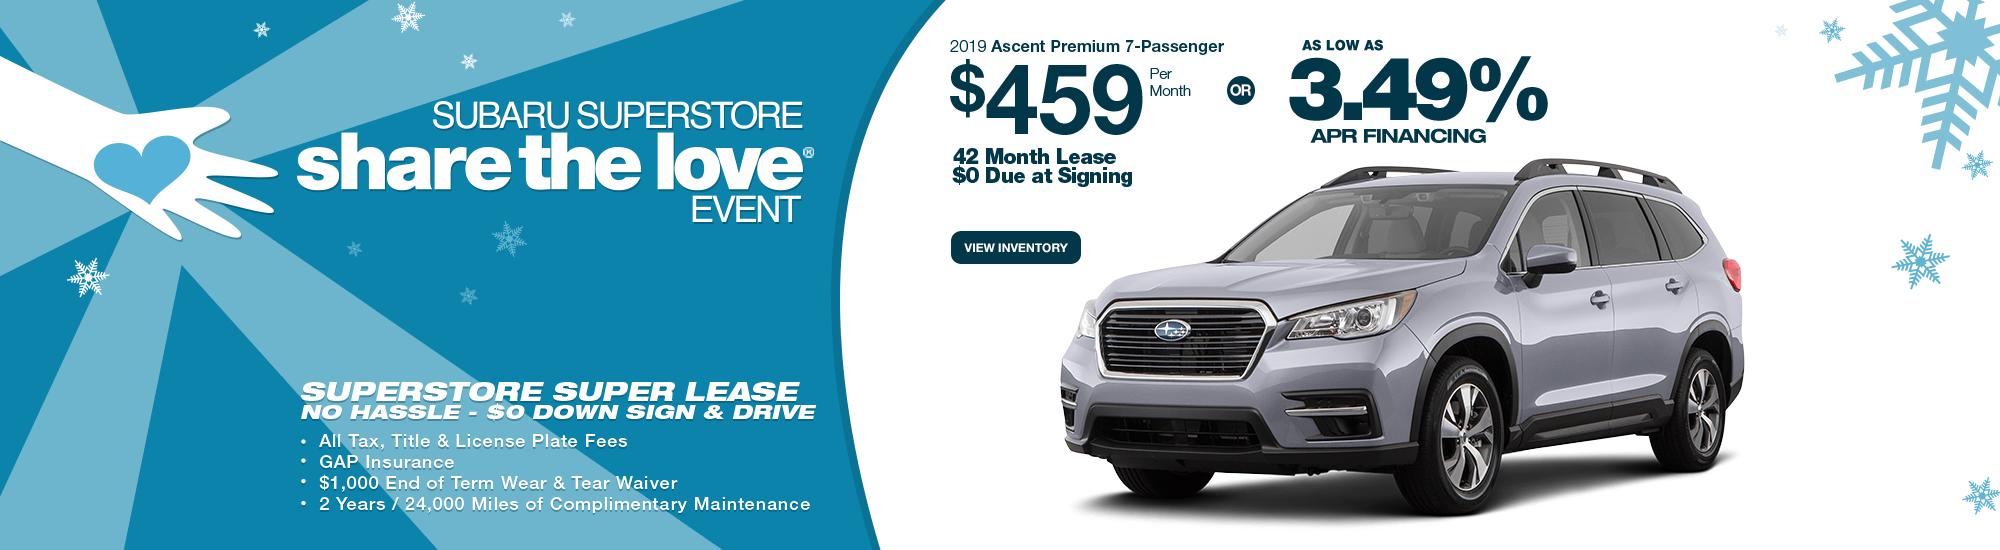 New 2019 Subaru Ascent Lease Special & Finance Offers near Phoenix, AZ